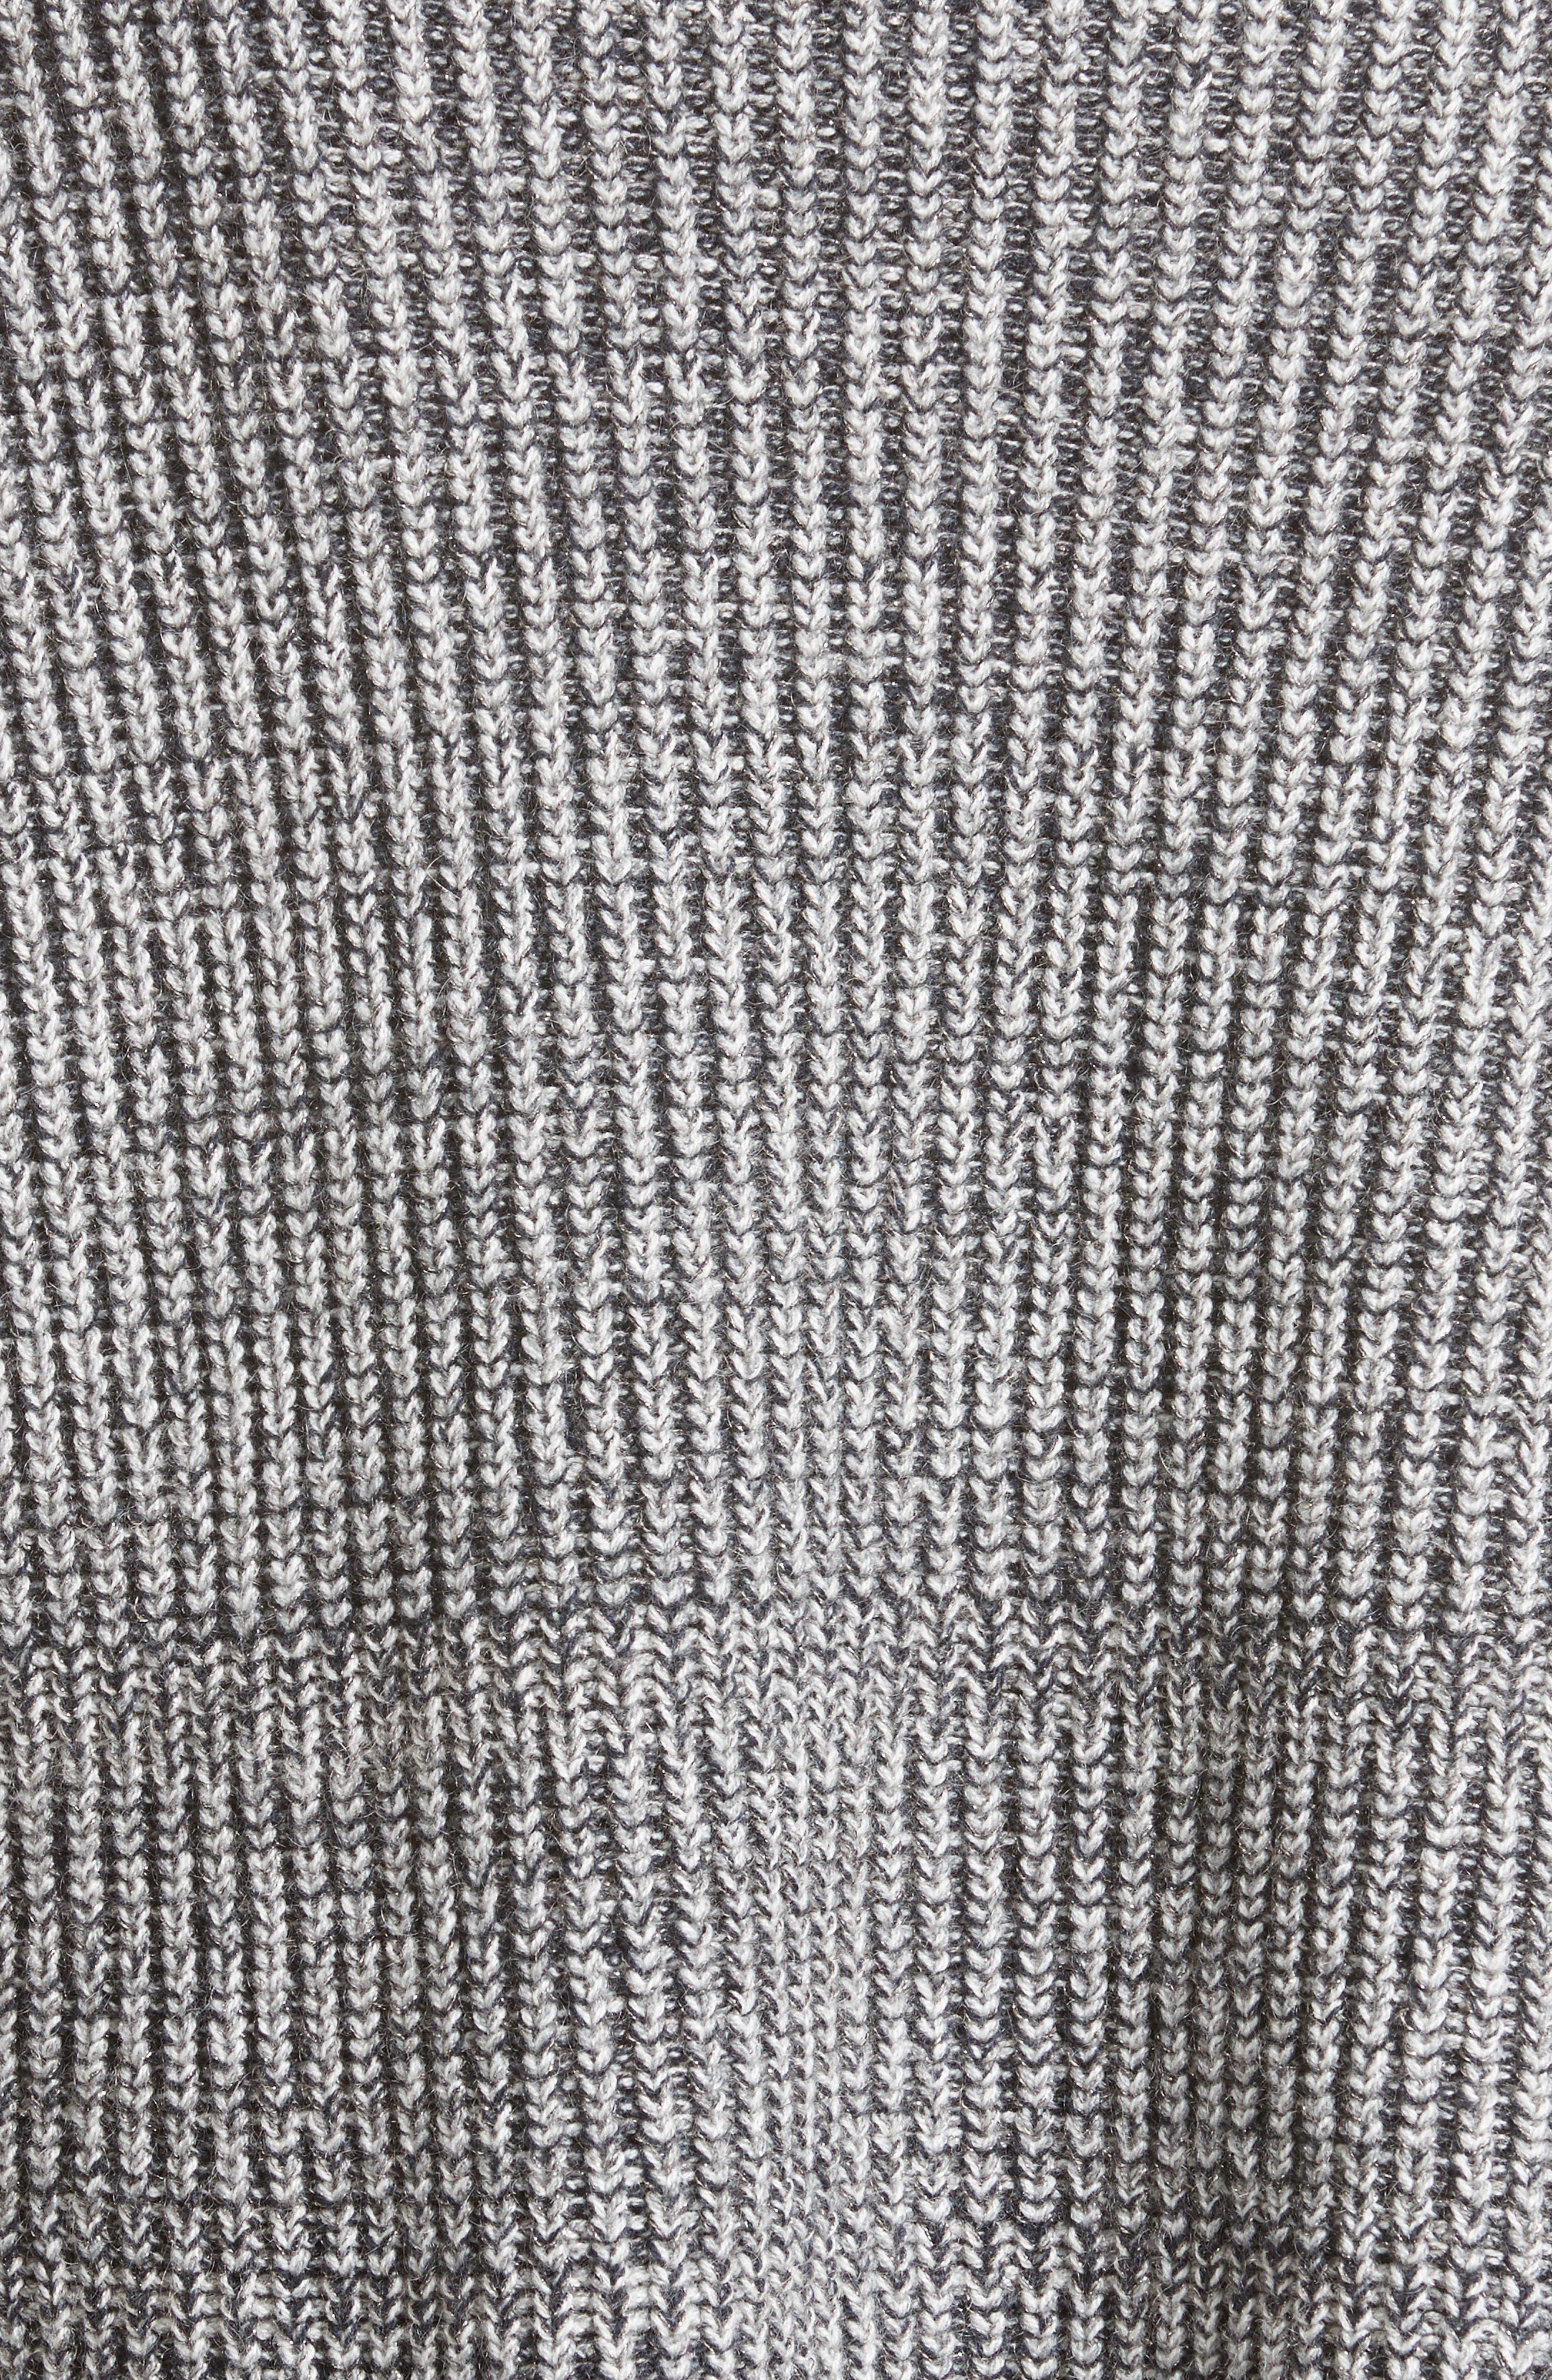 Herringbone Stitch Wool Blend Sweater,                             Alternate thumbnail 3, color,                             Grey Multi